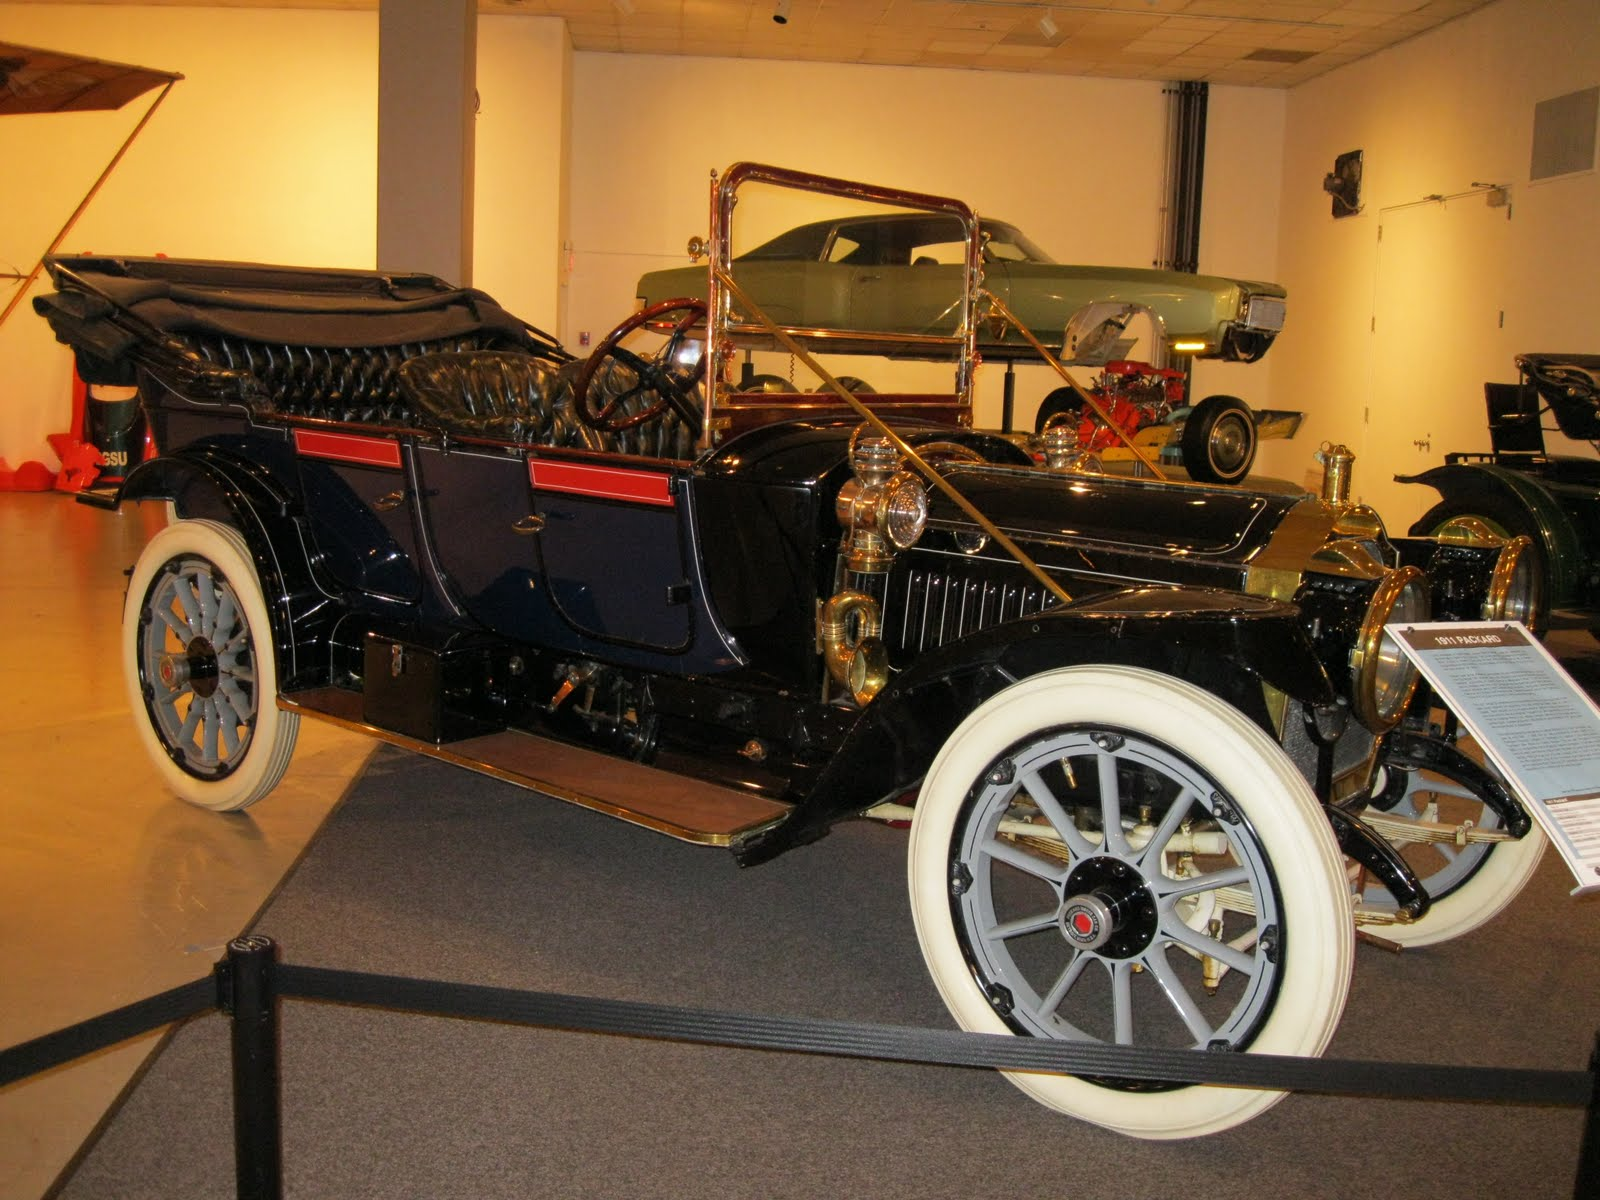 luxury autos of the era.